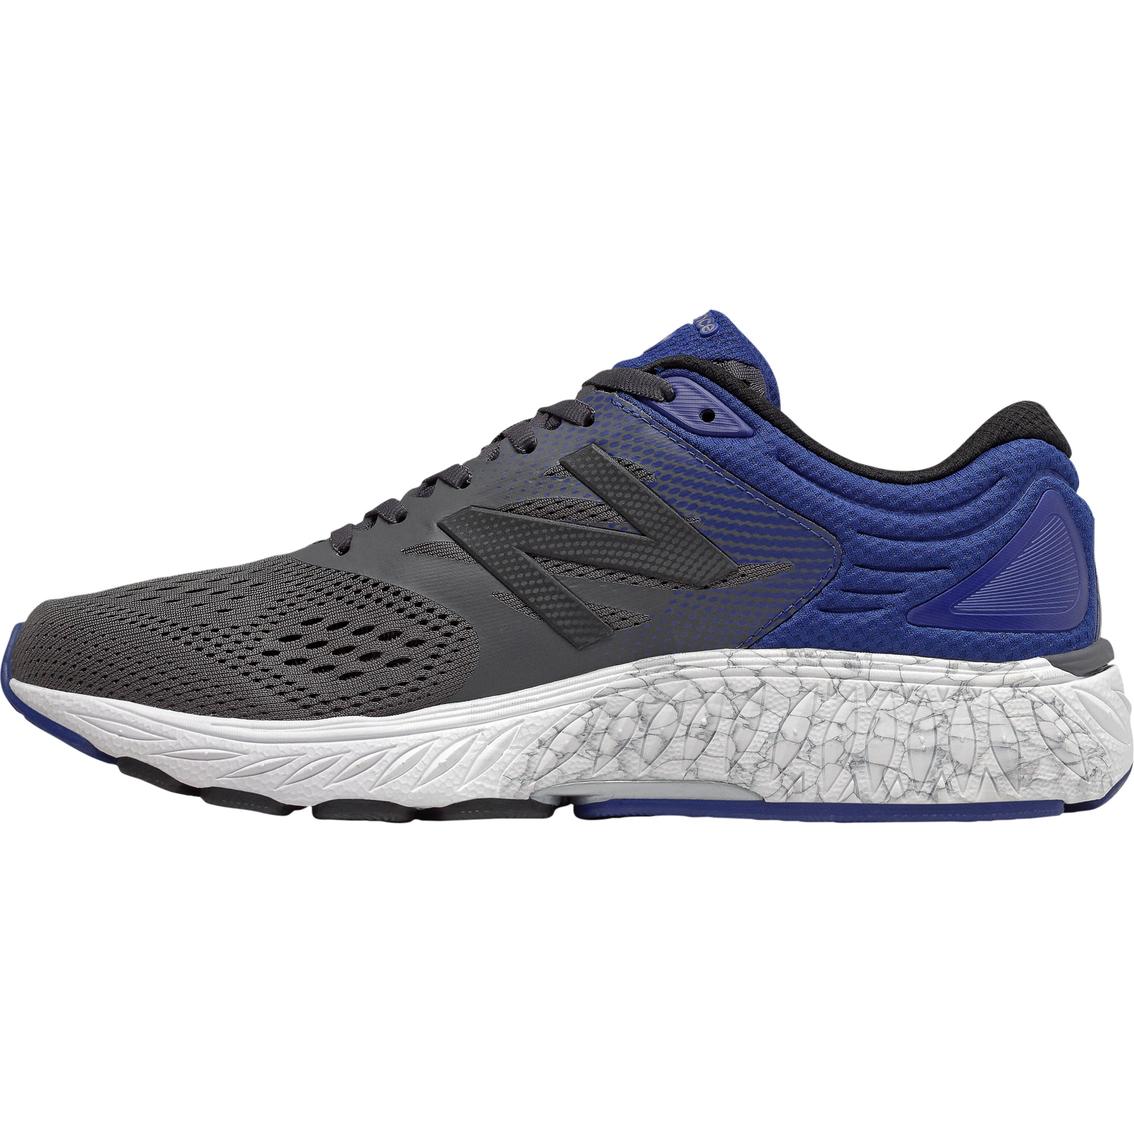 exagerar nombre enjuague  New Balance Men's M940gb4 Stability Running Shoe | Running | Shoes | Shop  The Exchange